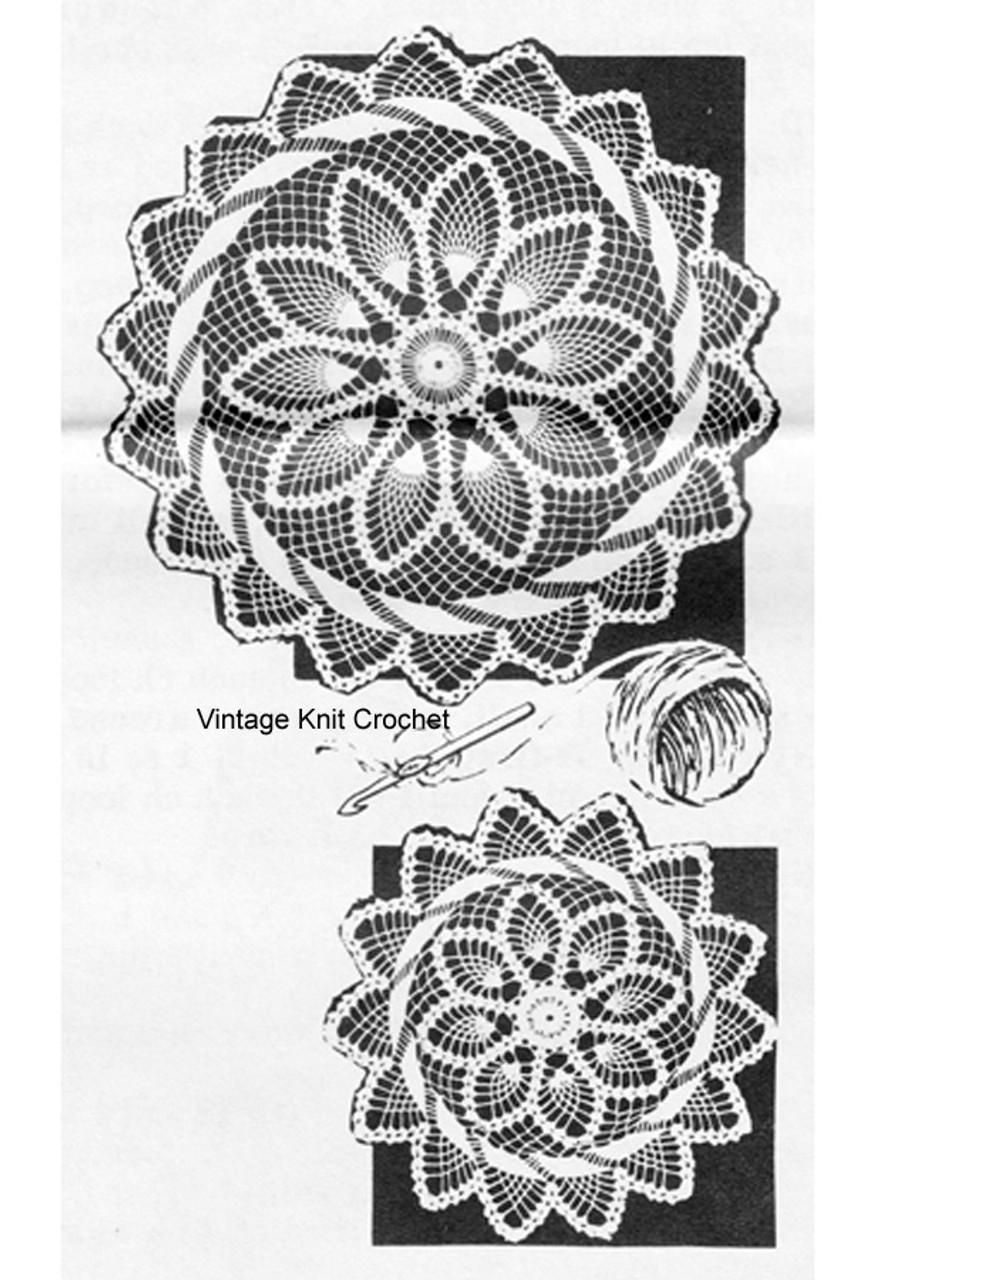 Pineapple Crocheted Swirl Doily Pattern, Laura Wheeler 781